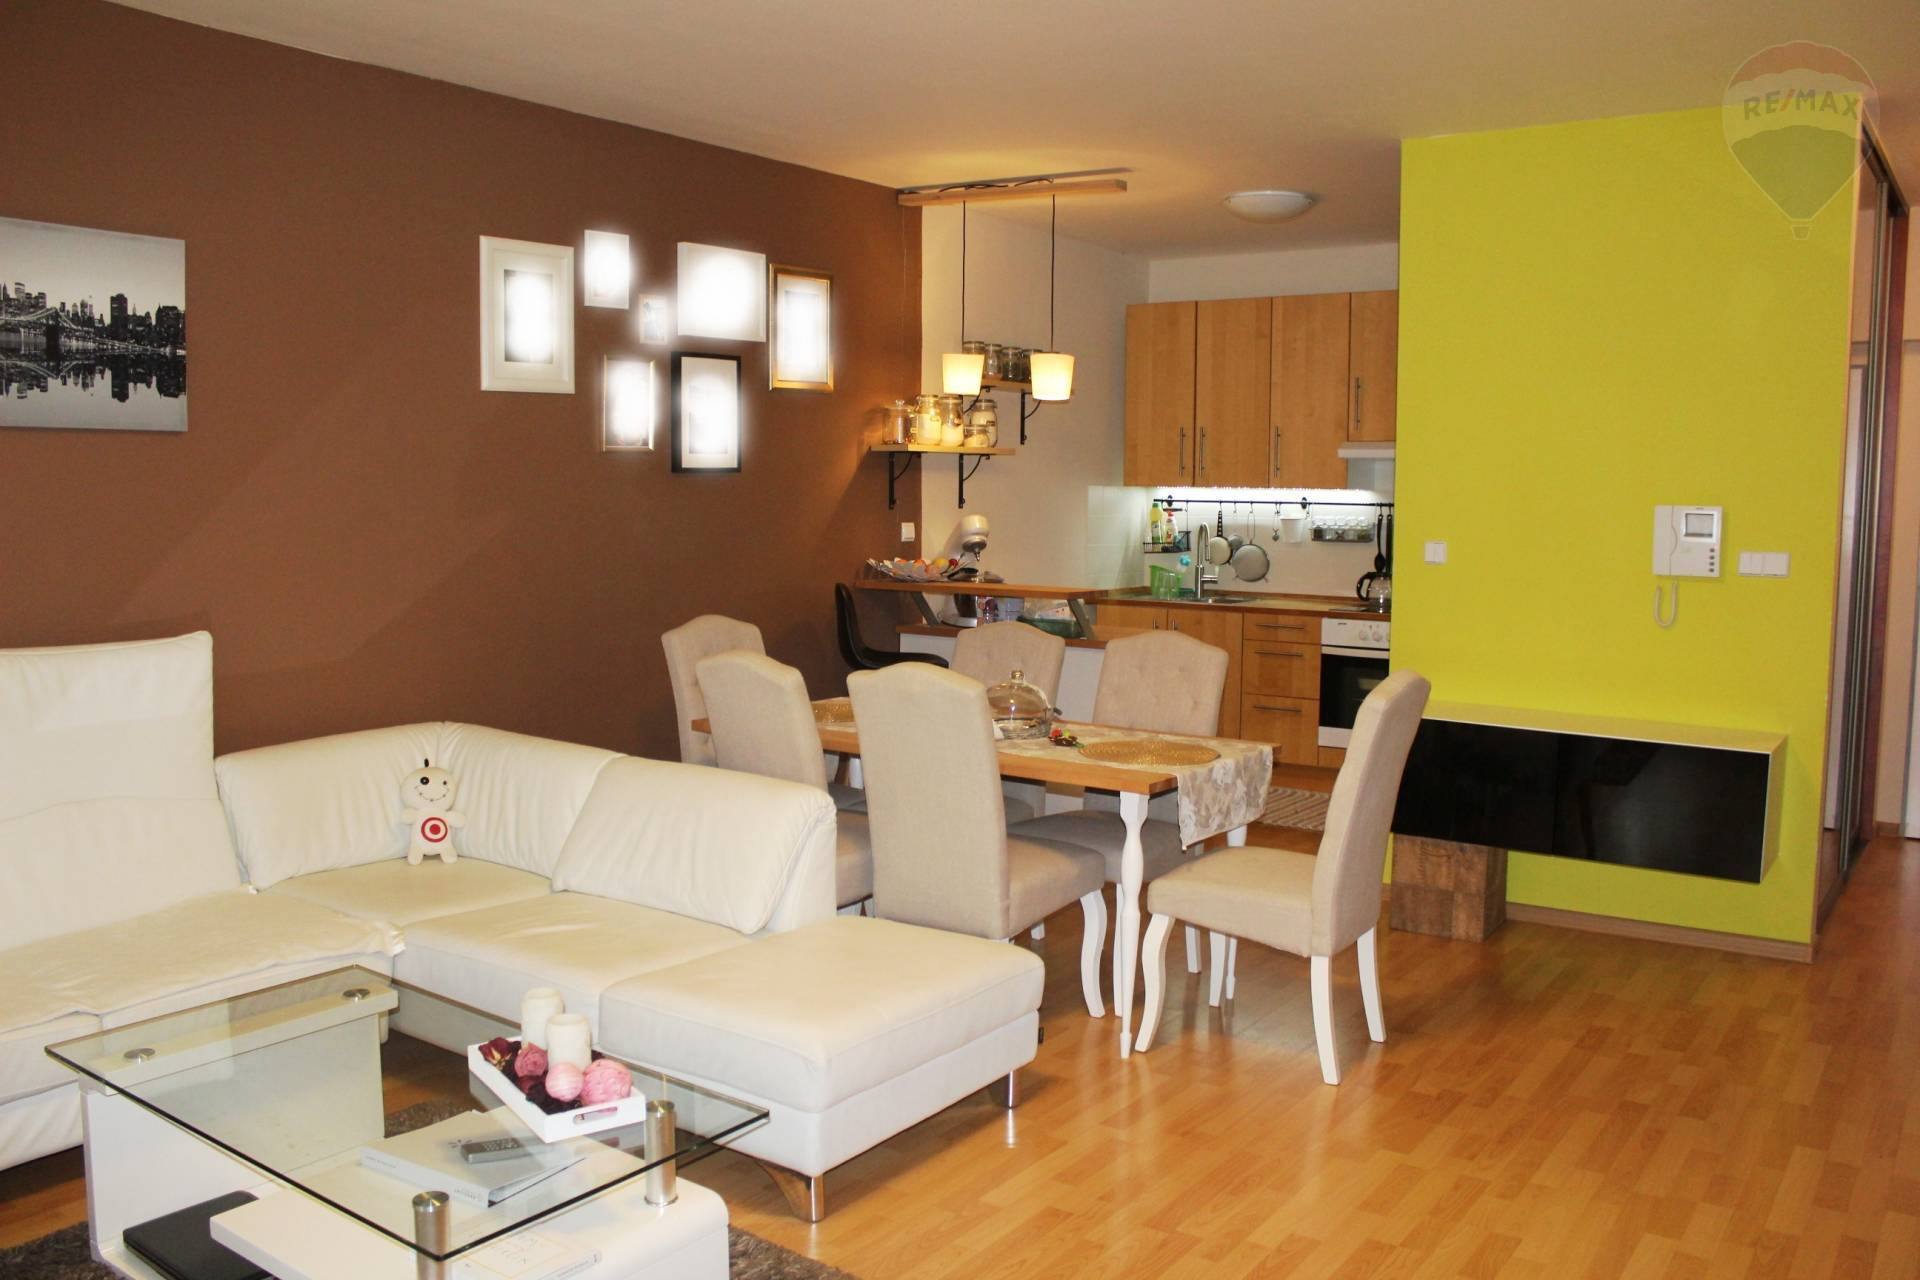 2-izbový byt pri Kuchajde 68 m2 s loggiou v KOLOSEU